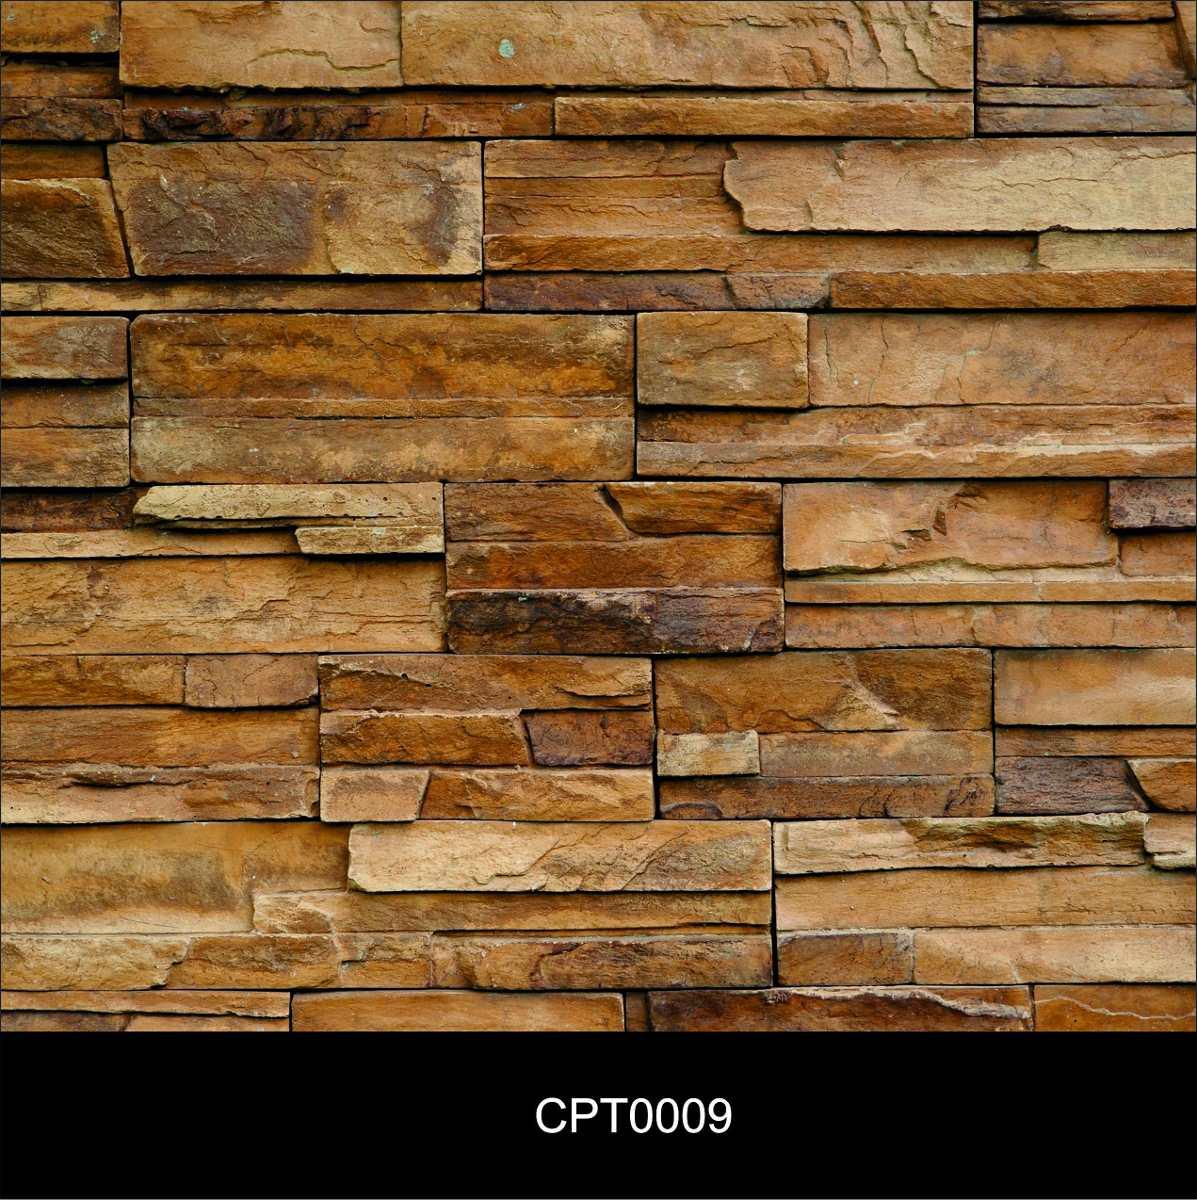 Papel De Parede Pedra 3d Autocolante Cl Ssico Lav Vel R 49 90  -> Papel De Parede De Pedra